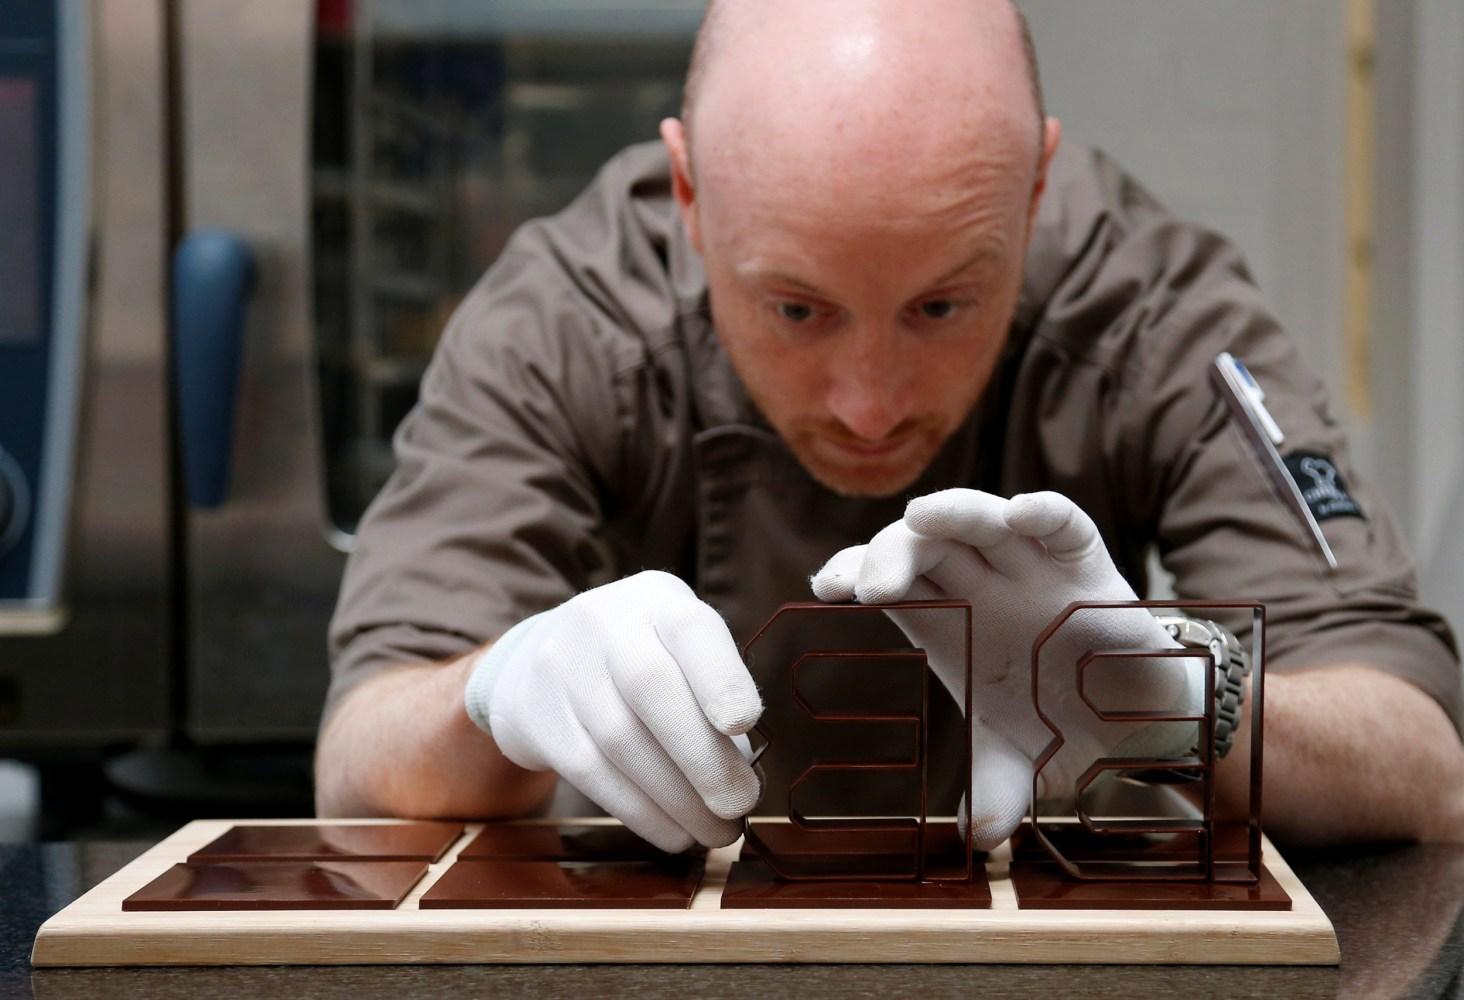 Belgian Chocolatier Turns to 3D Printer for Easter Treats - NBC News